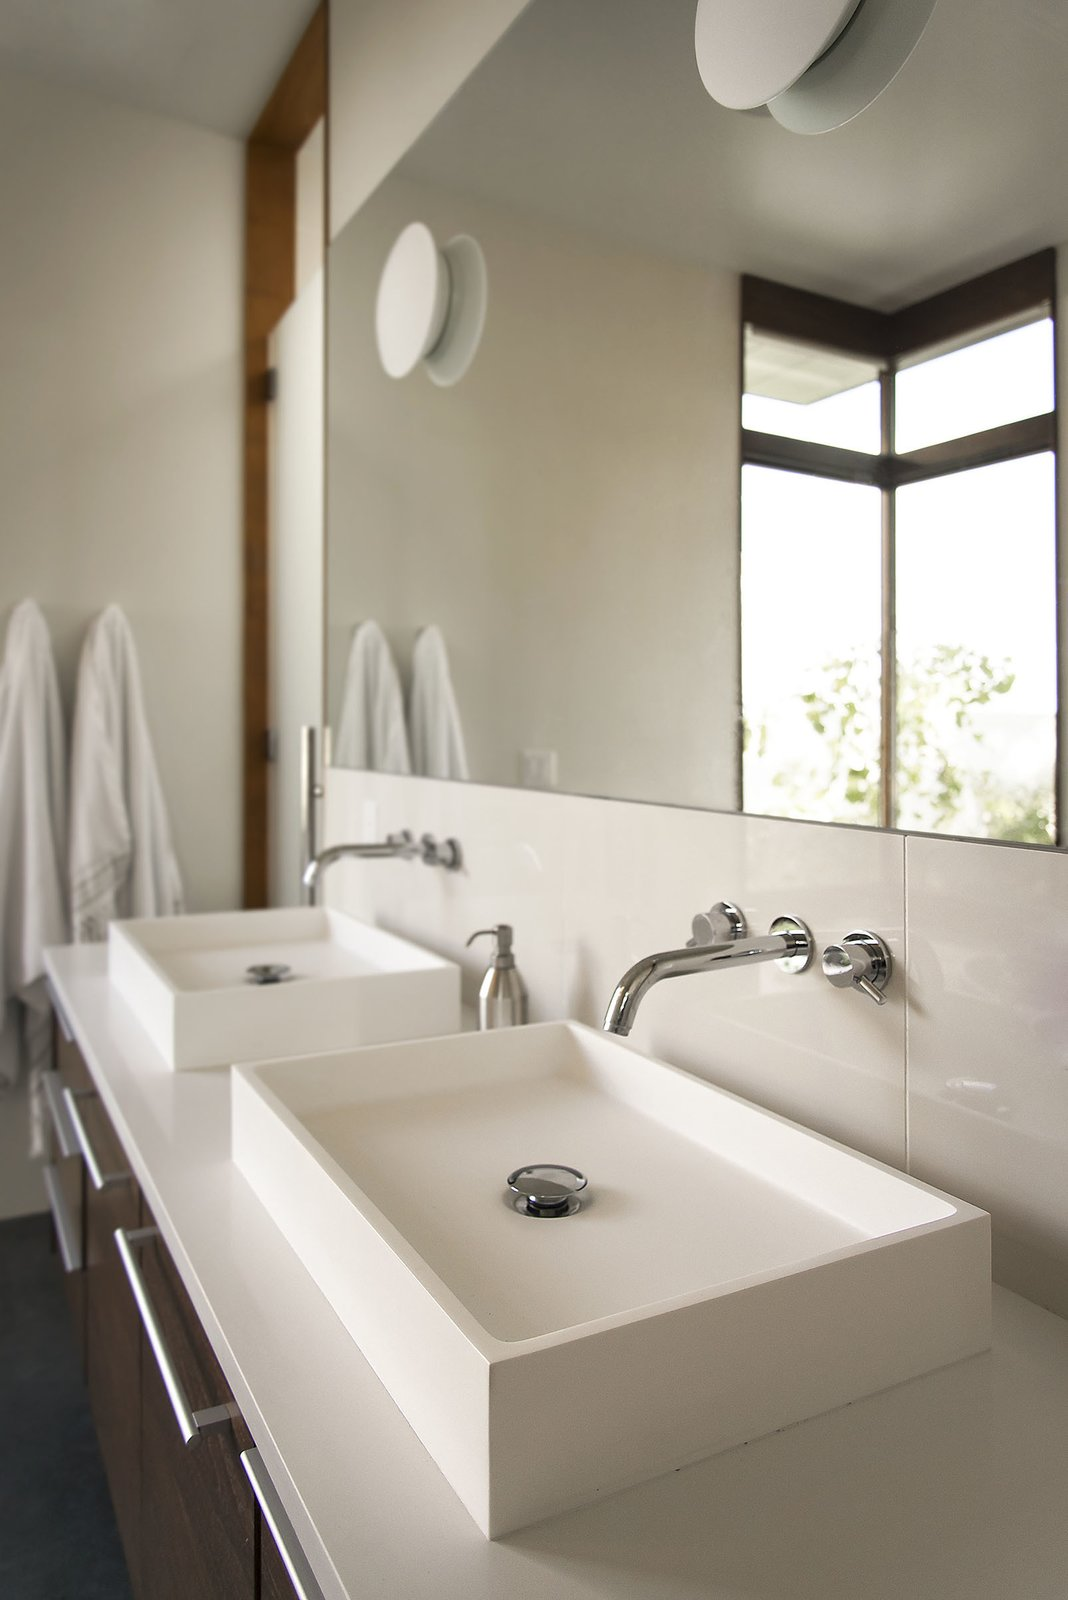 Master Bathroom - Vanity  Rock Canyon Residence by Imbue Design